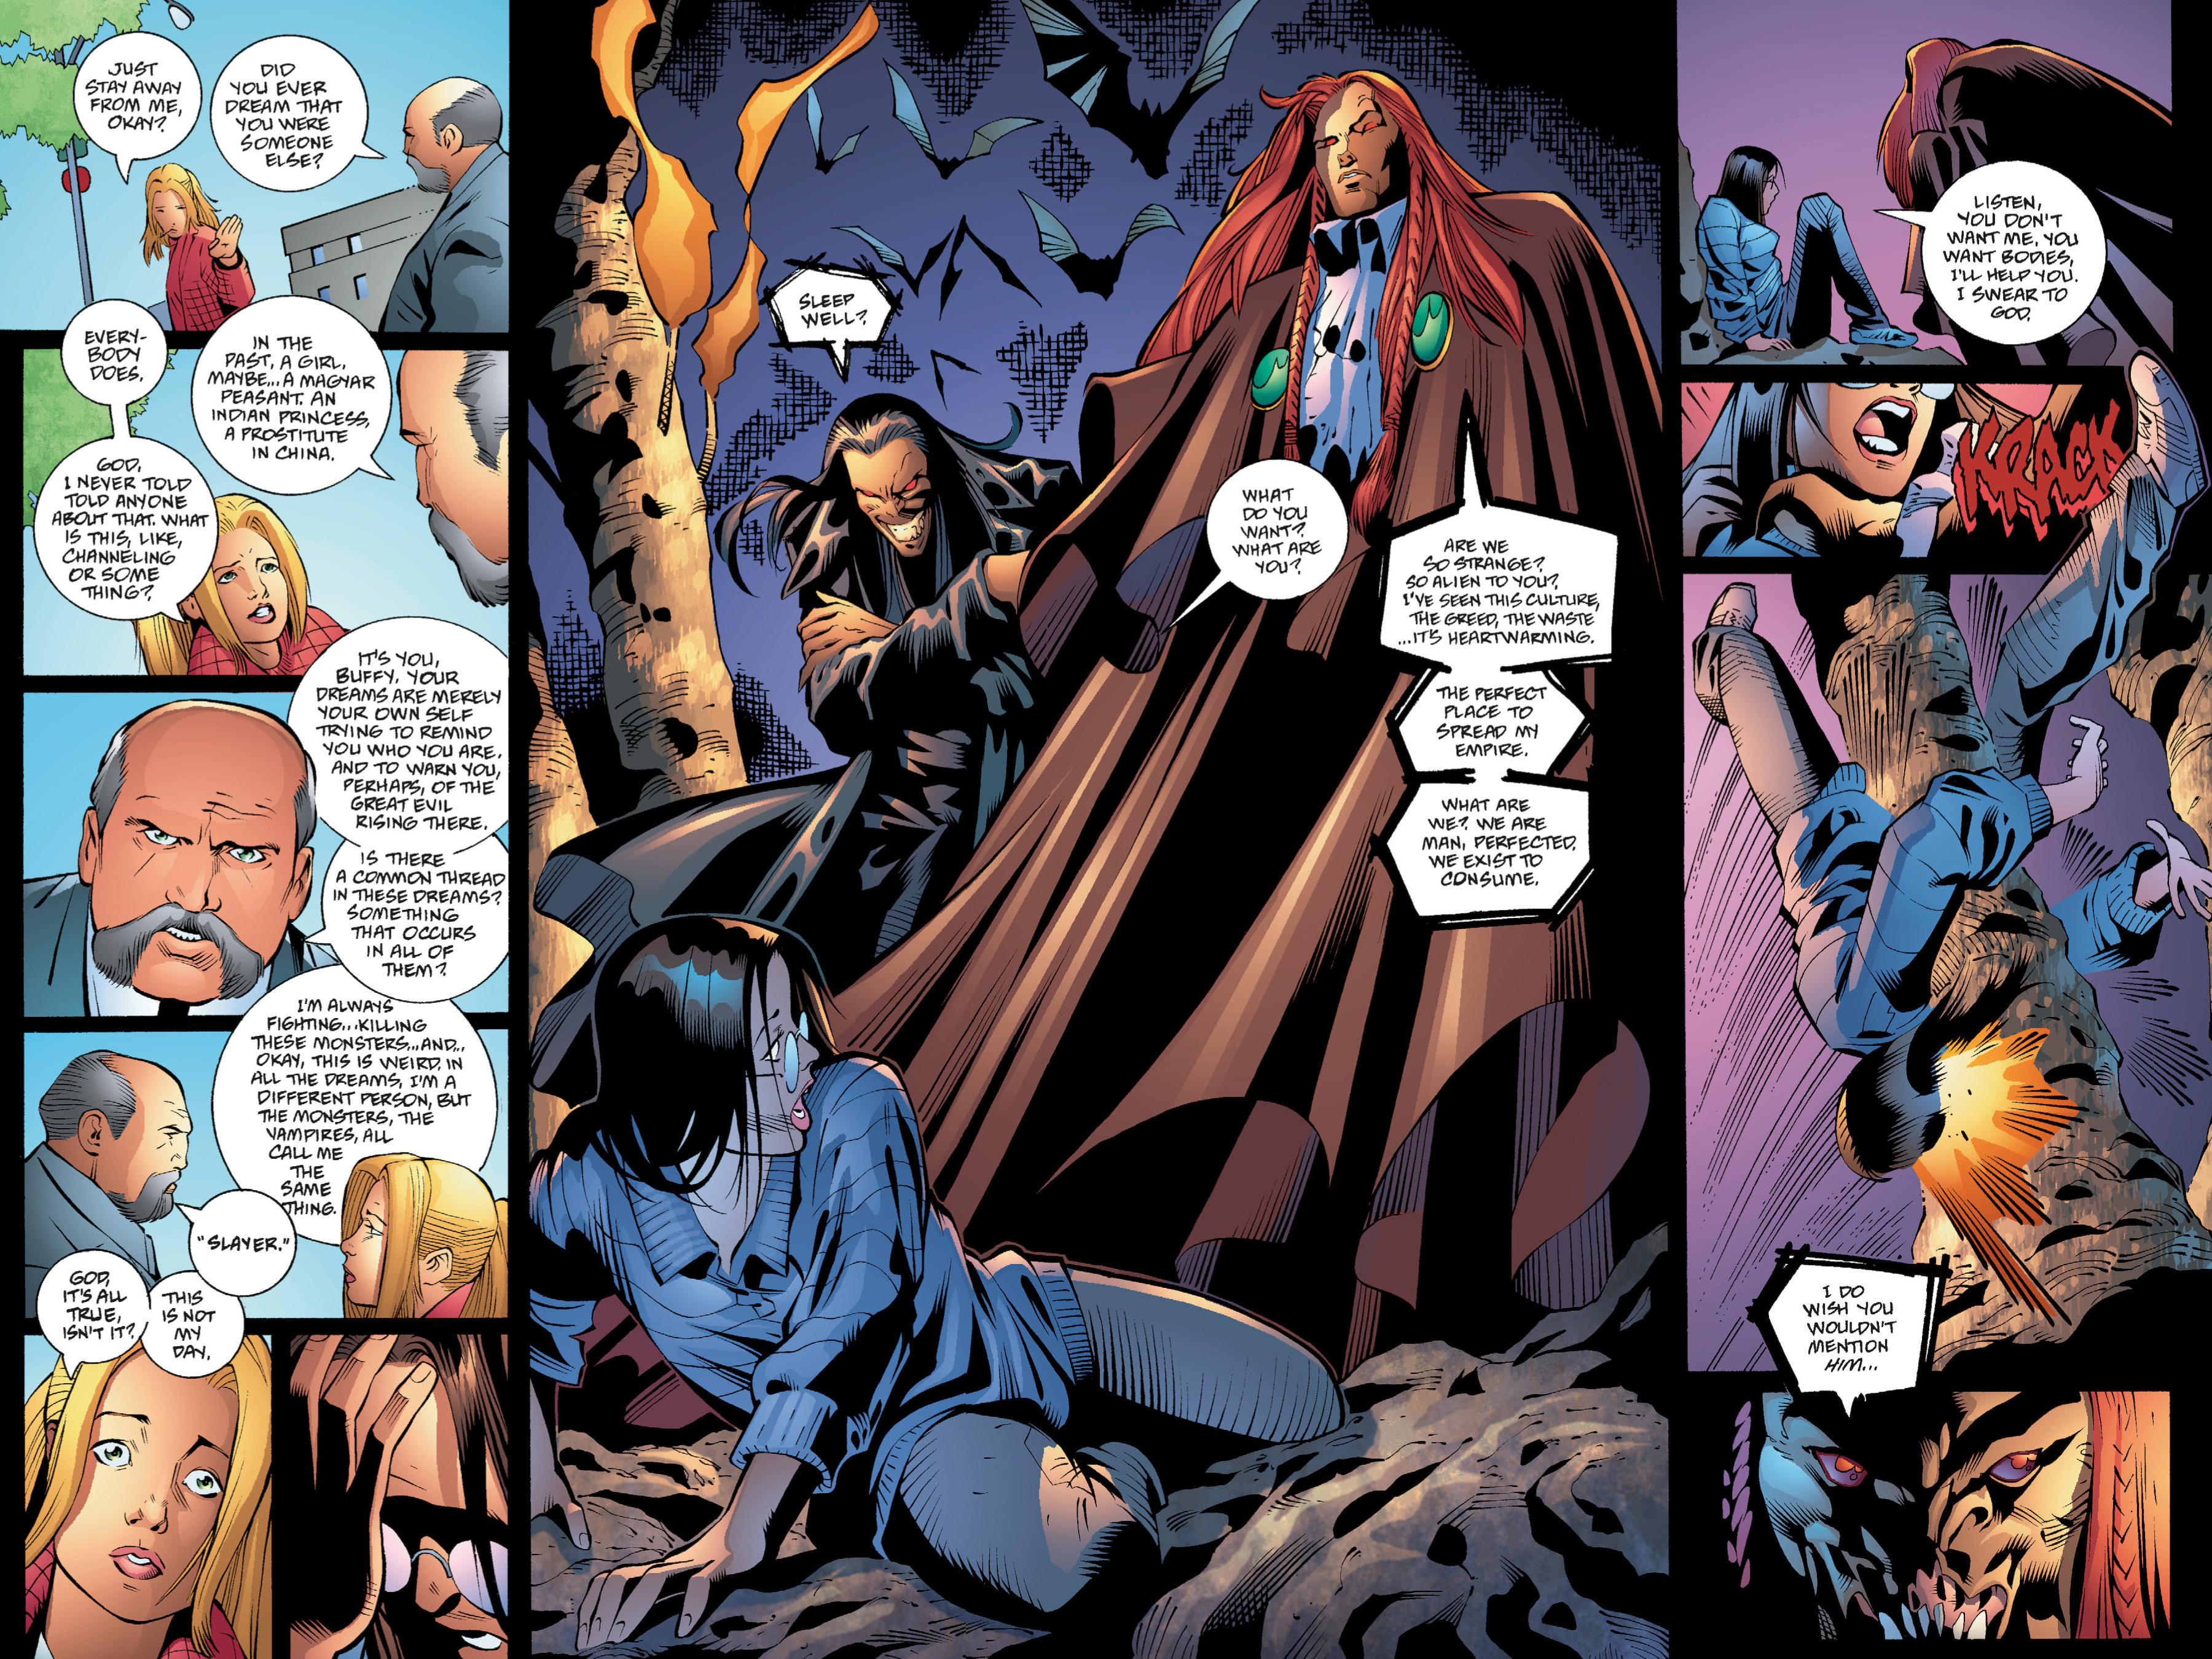 Read online Buffy the Vampire Slayer: Omnibus comic -  Issue # TPB 1 - 53